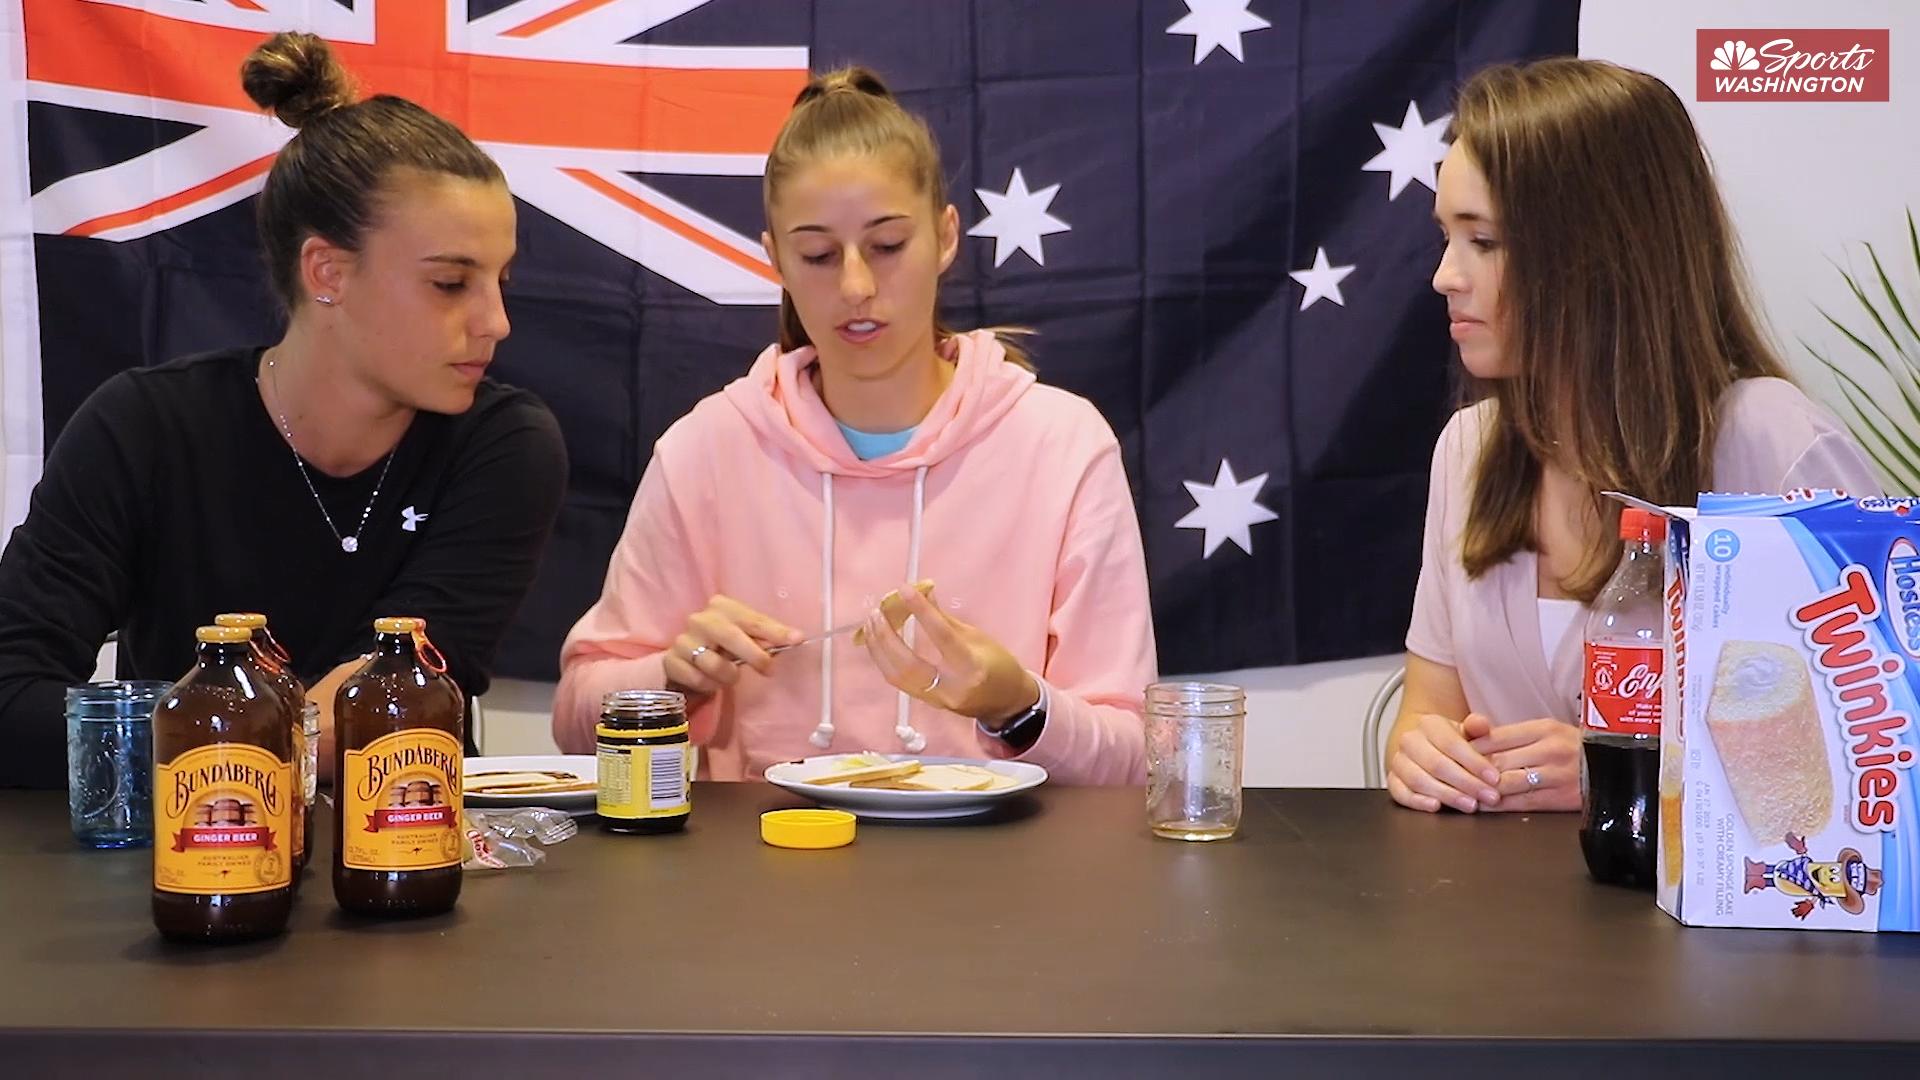 Australian Taste Test: Washington Spirit Aussies serve up Vegemite